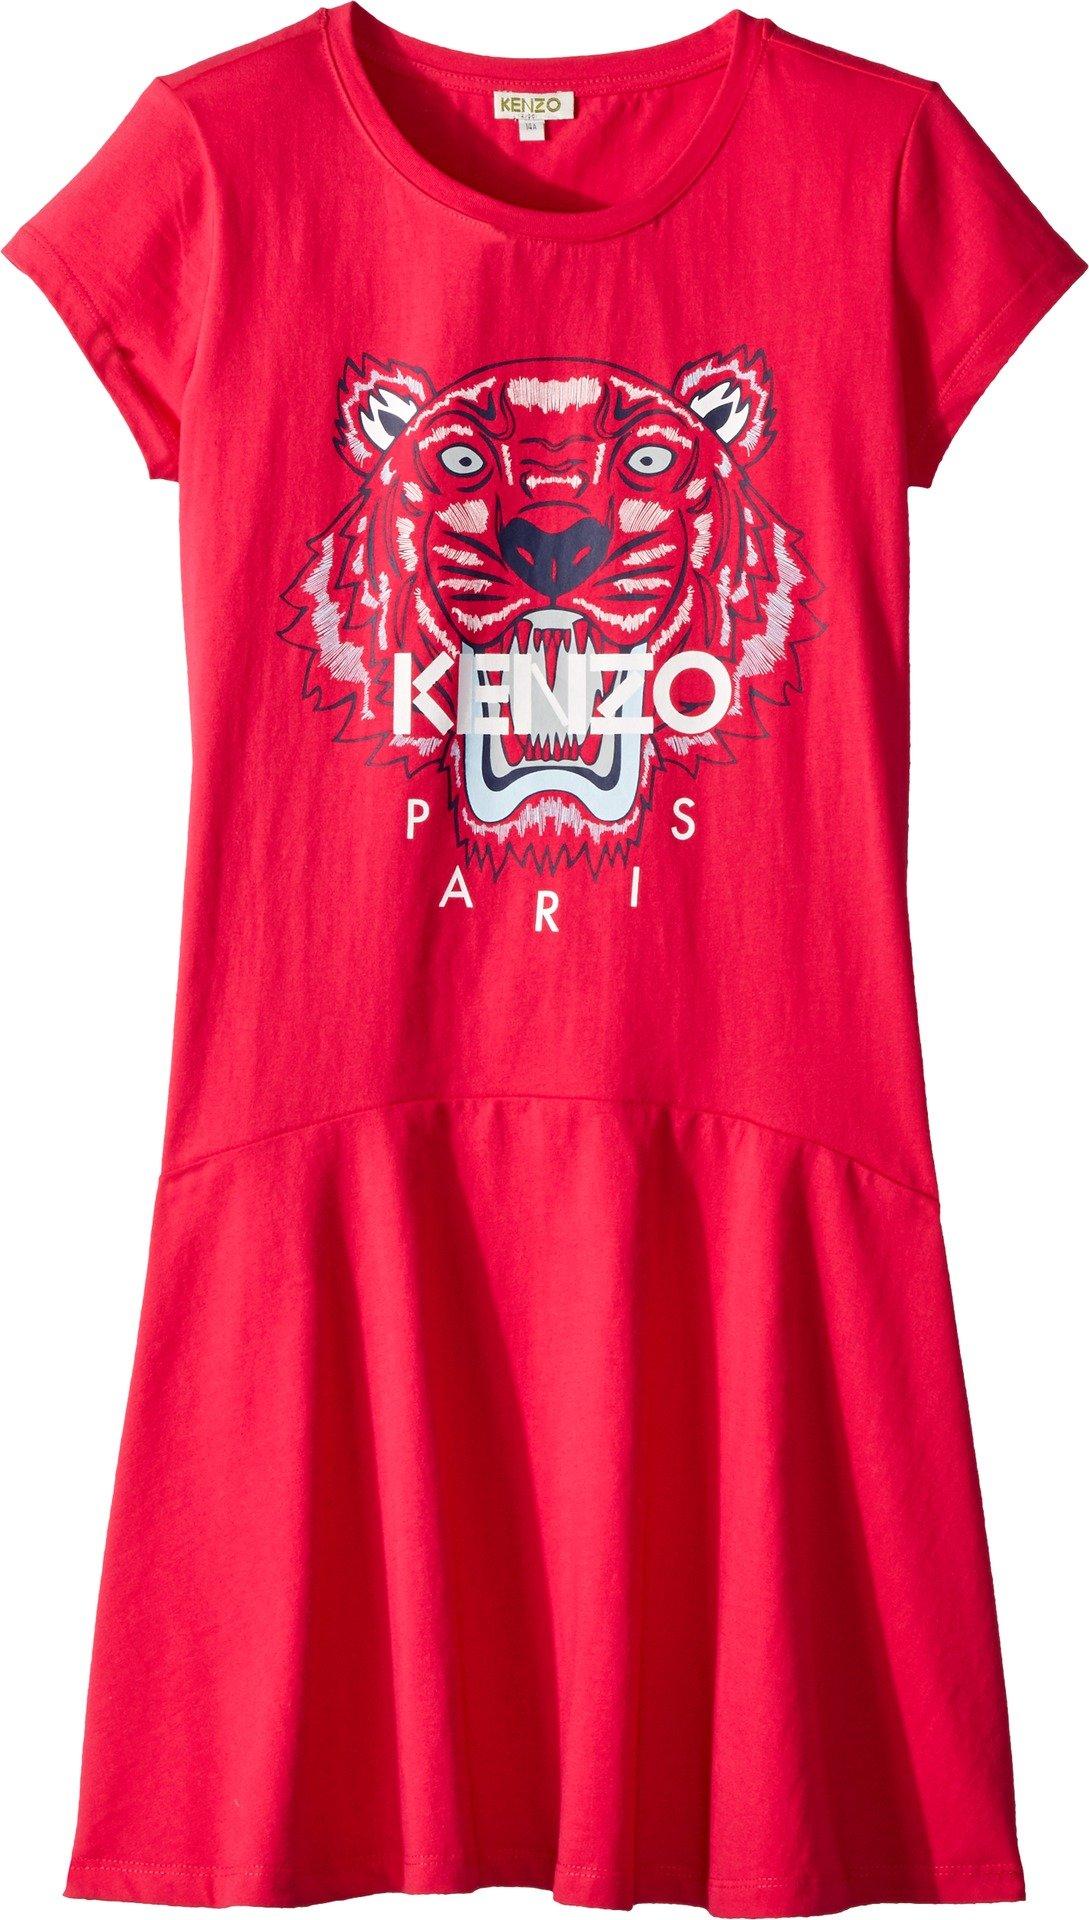 Kenzo Kids Girl's Dress Classic Tiger (Big Kids) Fuchsia 14